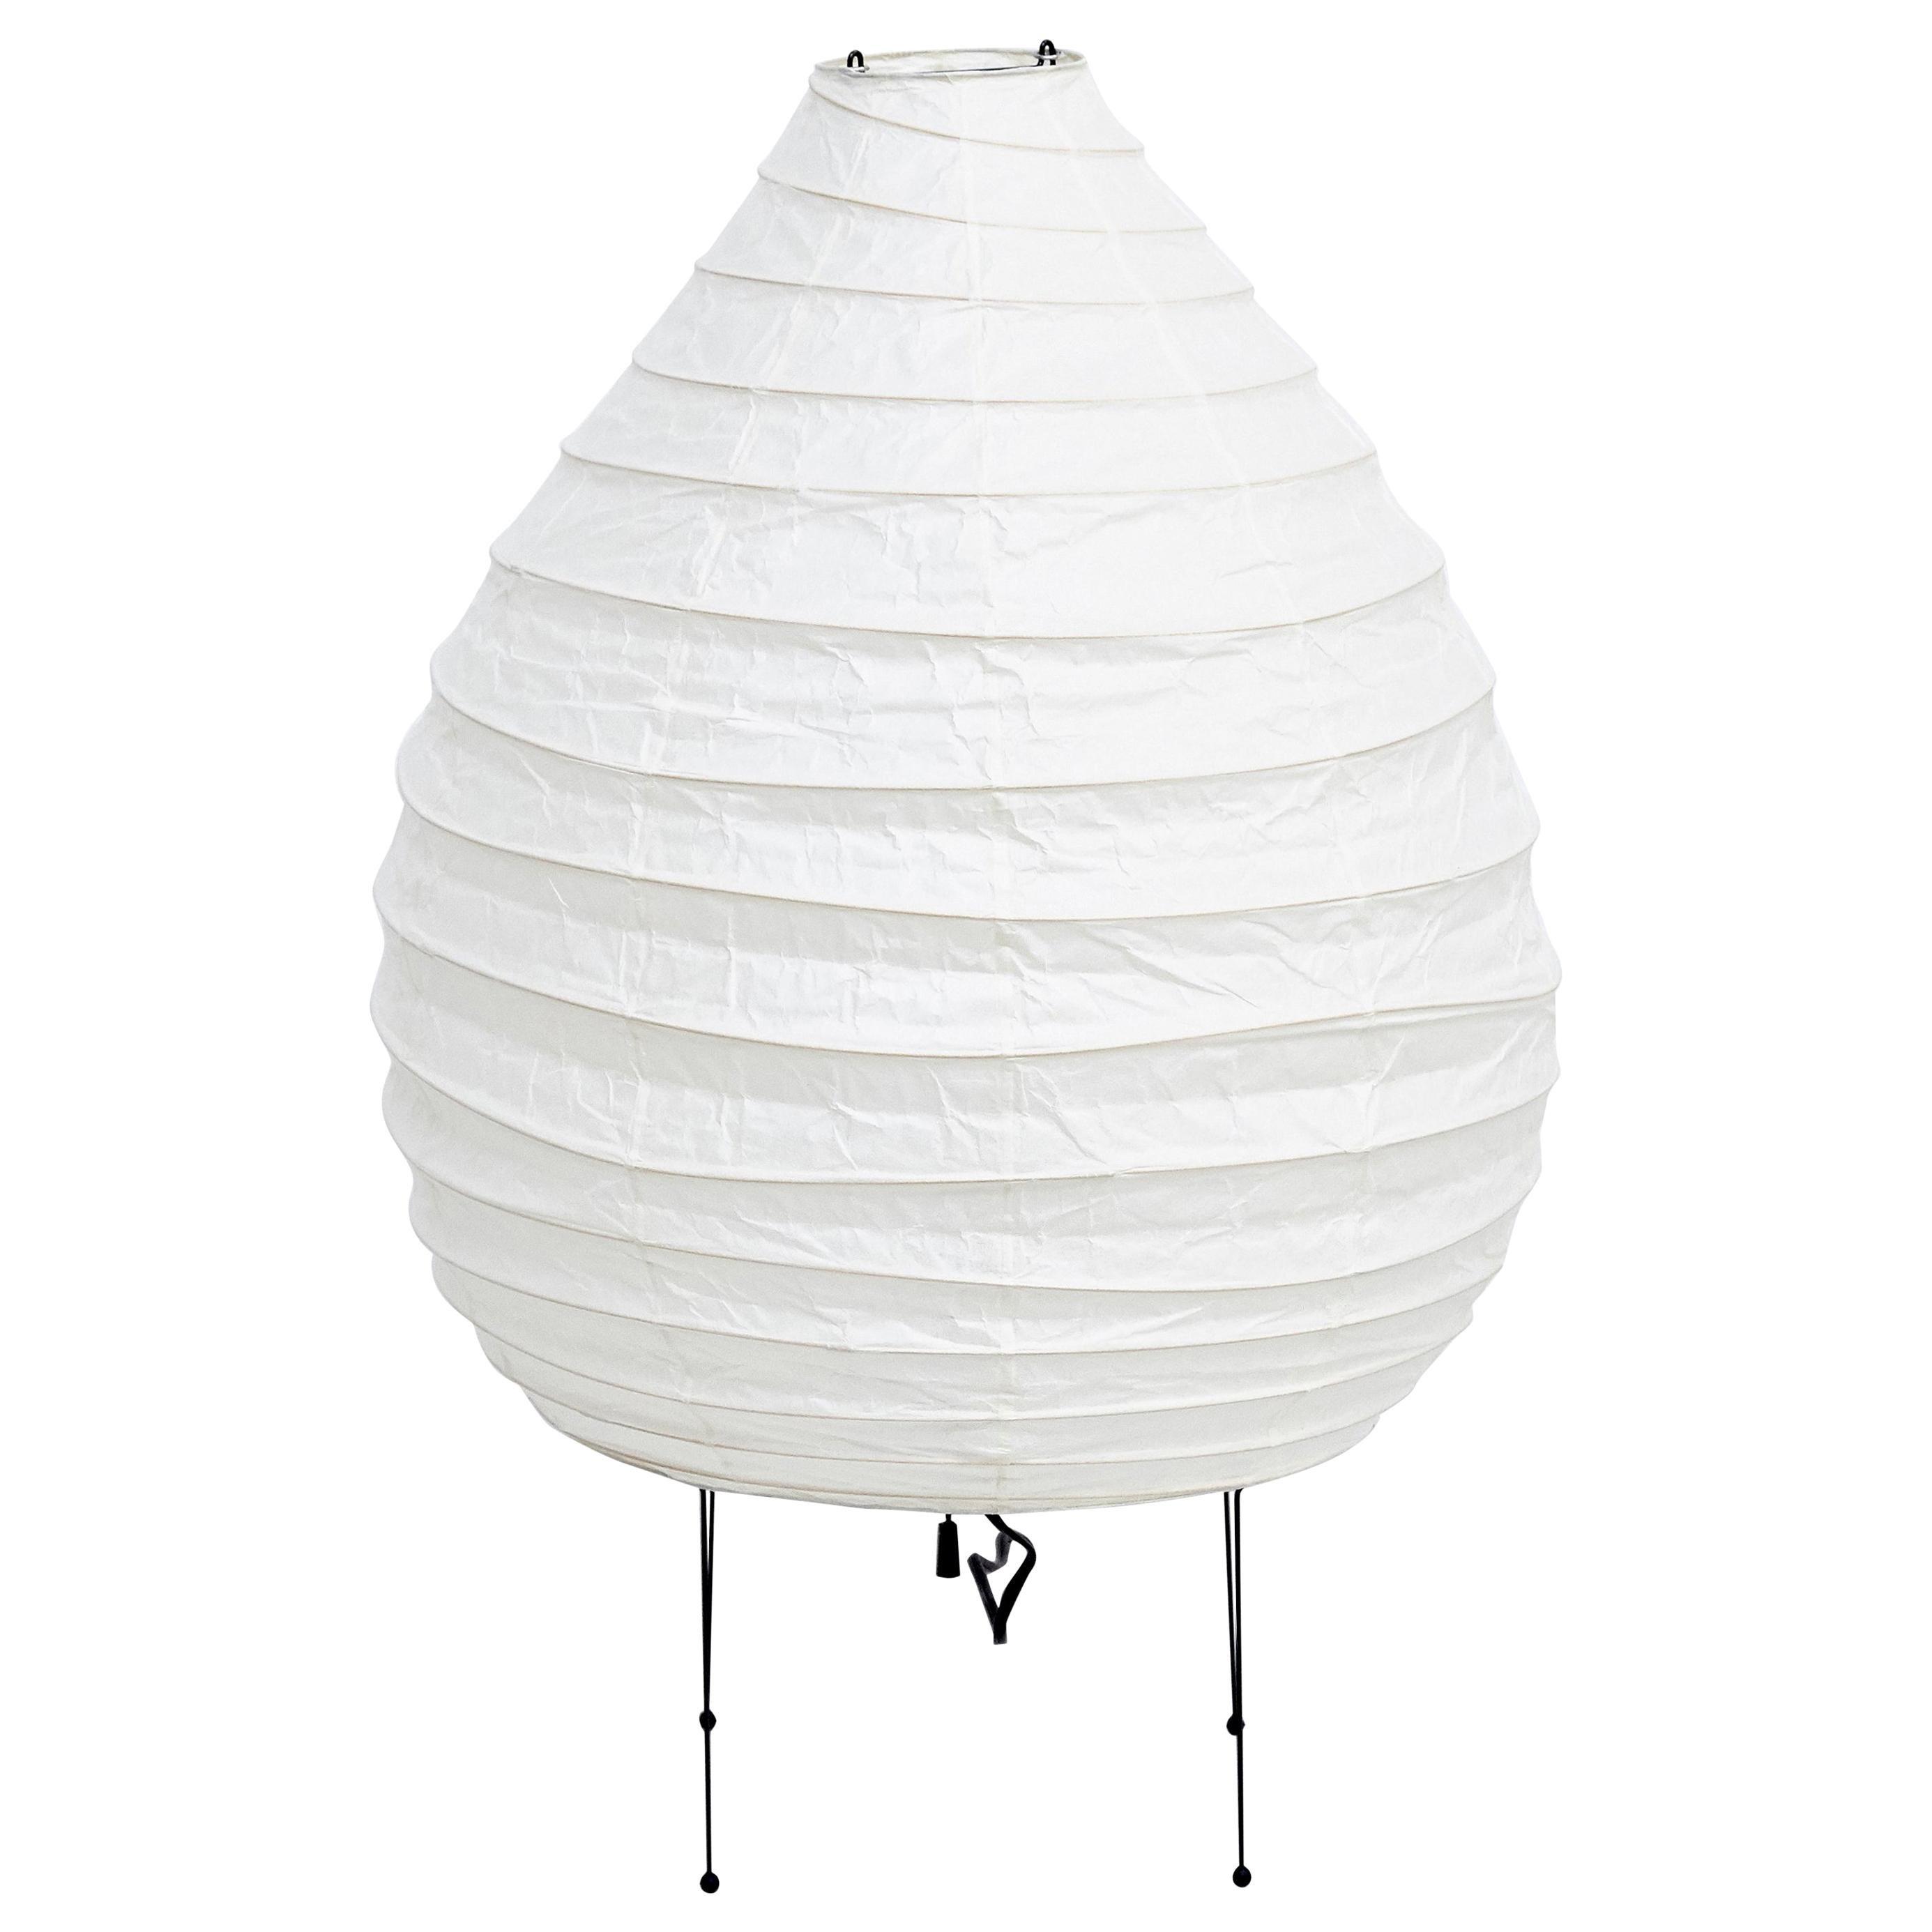 Isamu Noguchi Mid-Century Modern Akari Bamboo Washi Paper Floor Lamp 22N